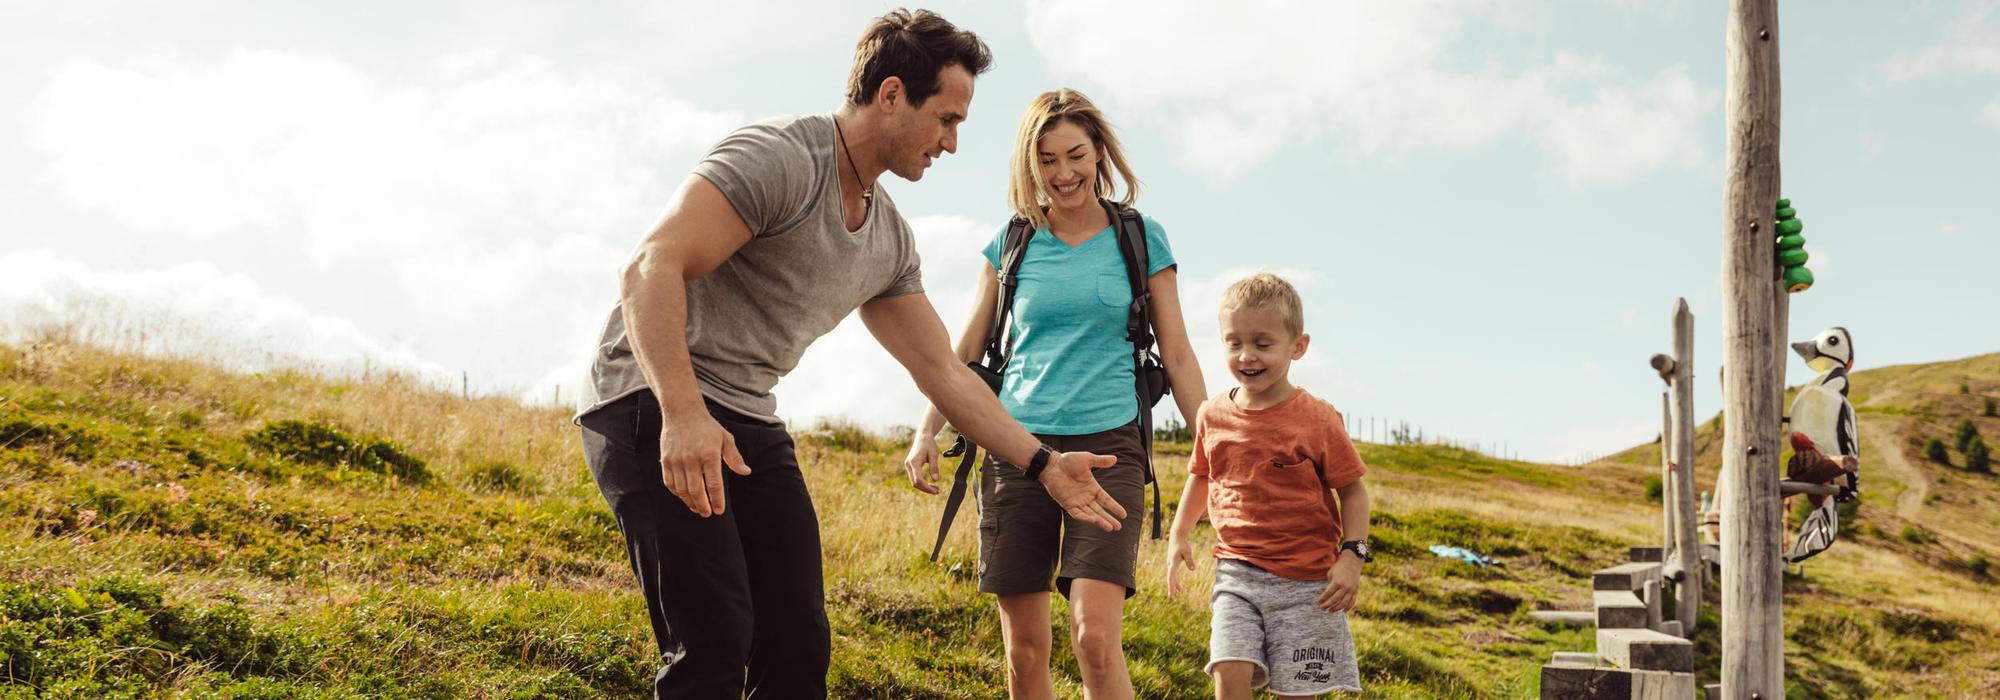 Familienwanderung Golzentipp Kindermeile   © TVB Osttirol / Attic Film GmbH